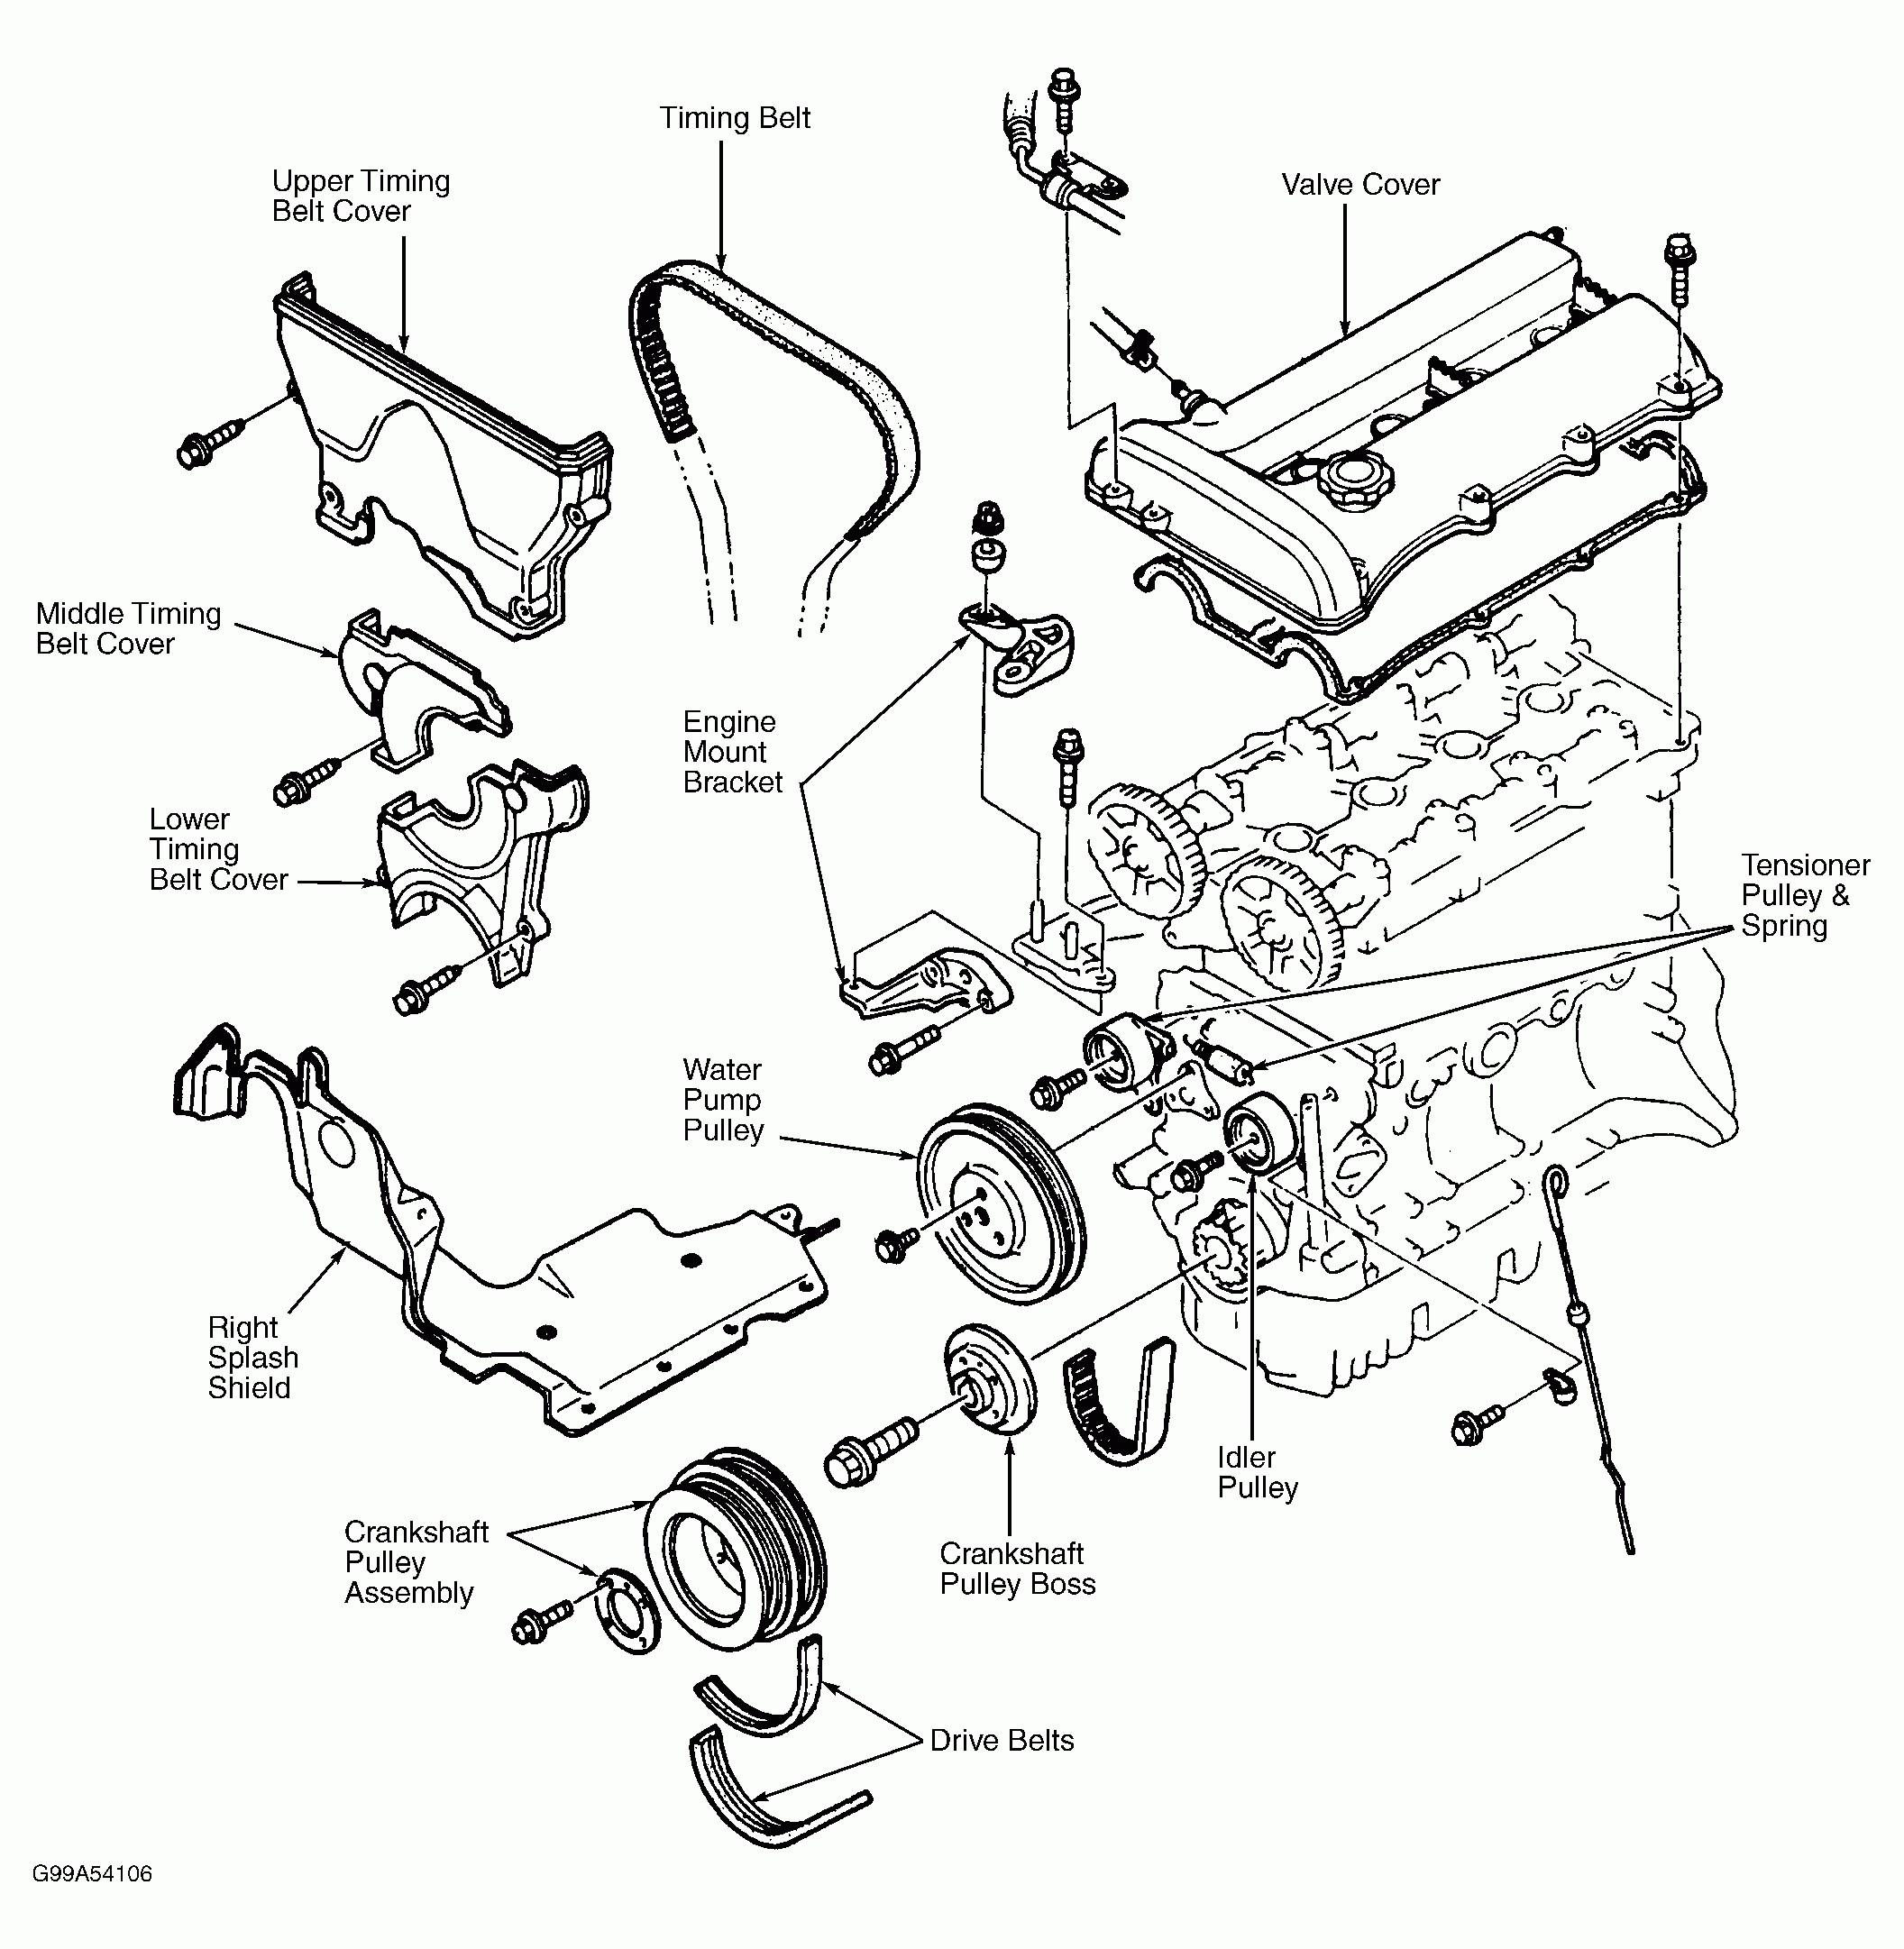 [WRG7489] 03 Chevy Silverado Fuse Box